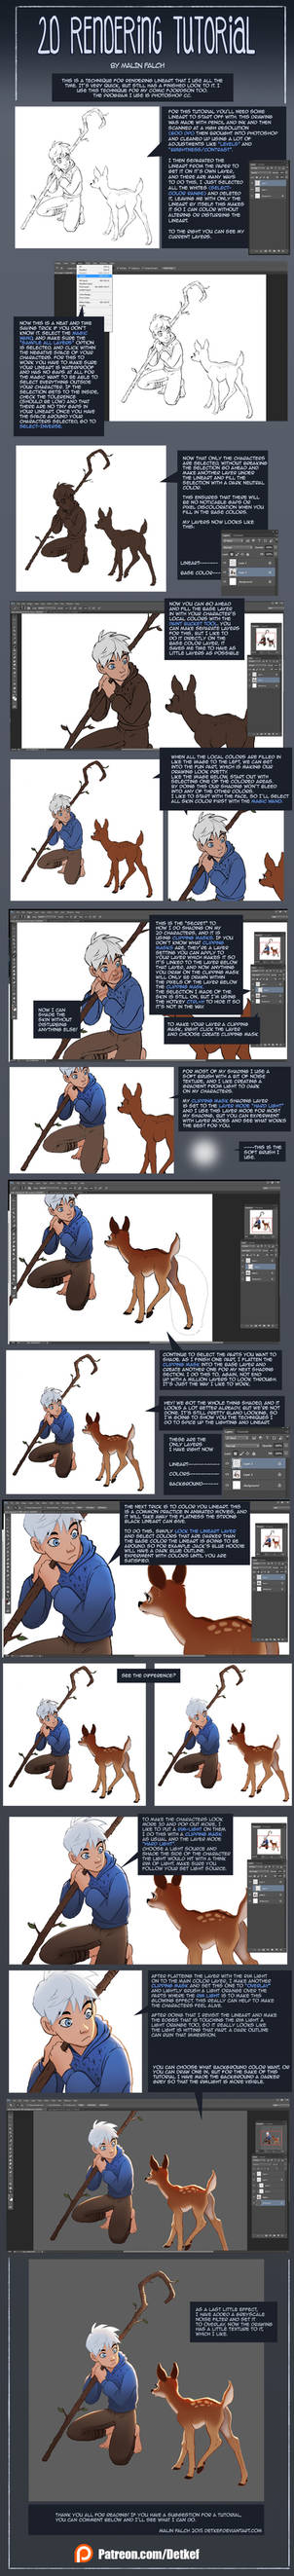 2d Coloring tutorial